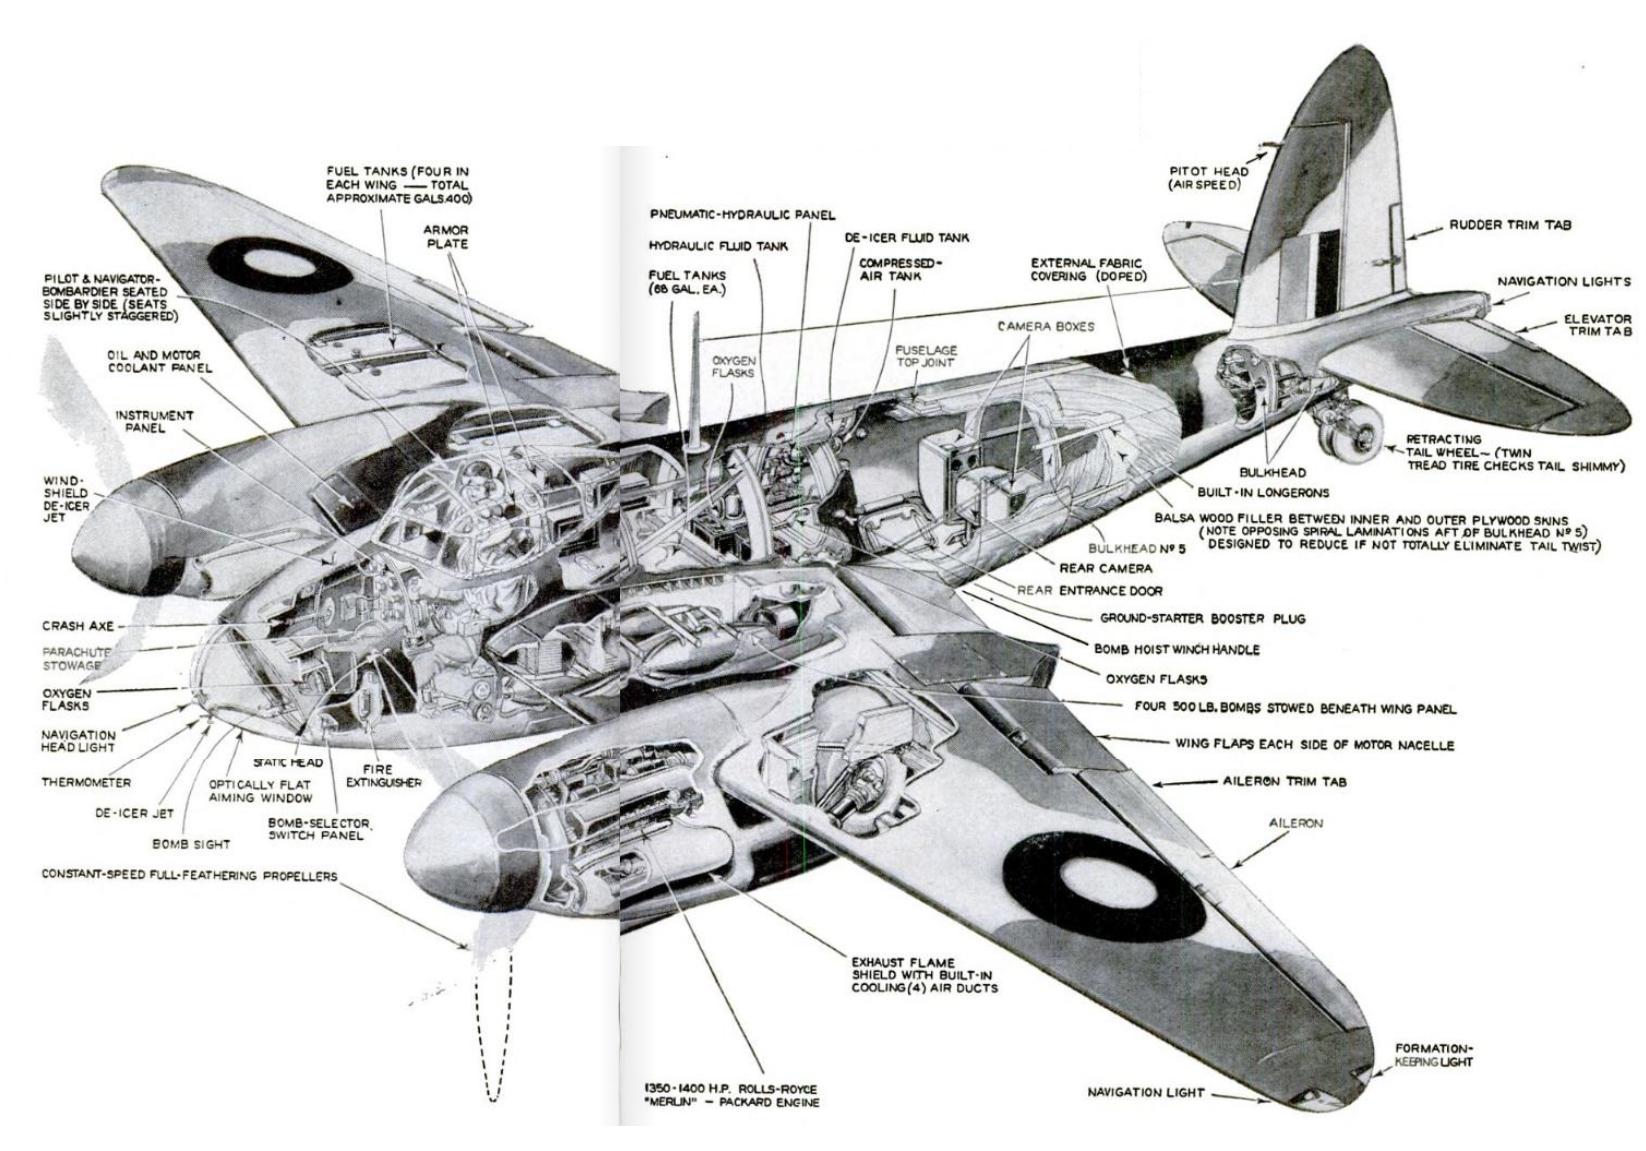 RAF Mosquito Cutaway Drawing, 1943